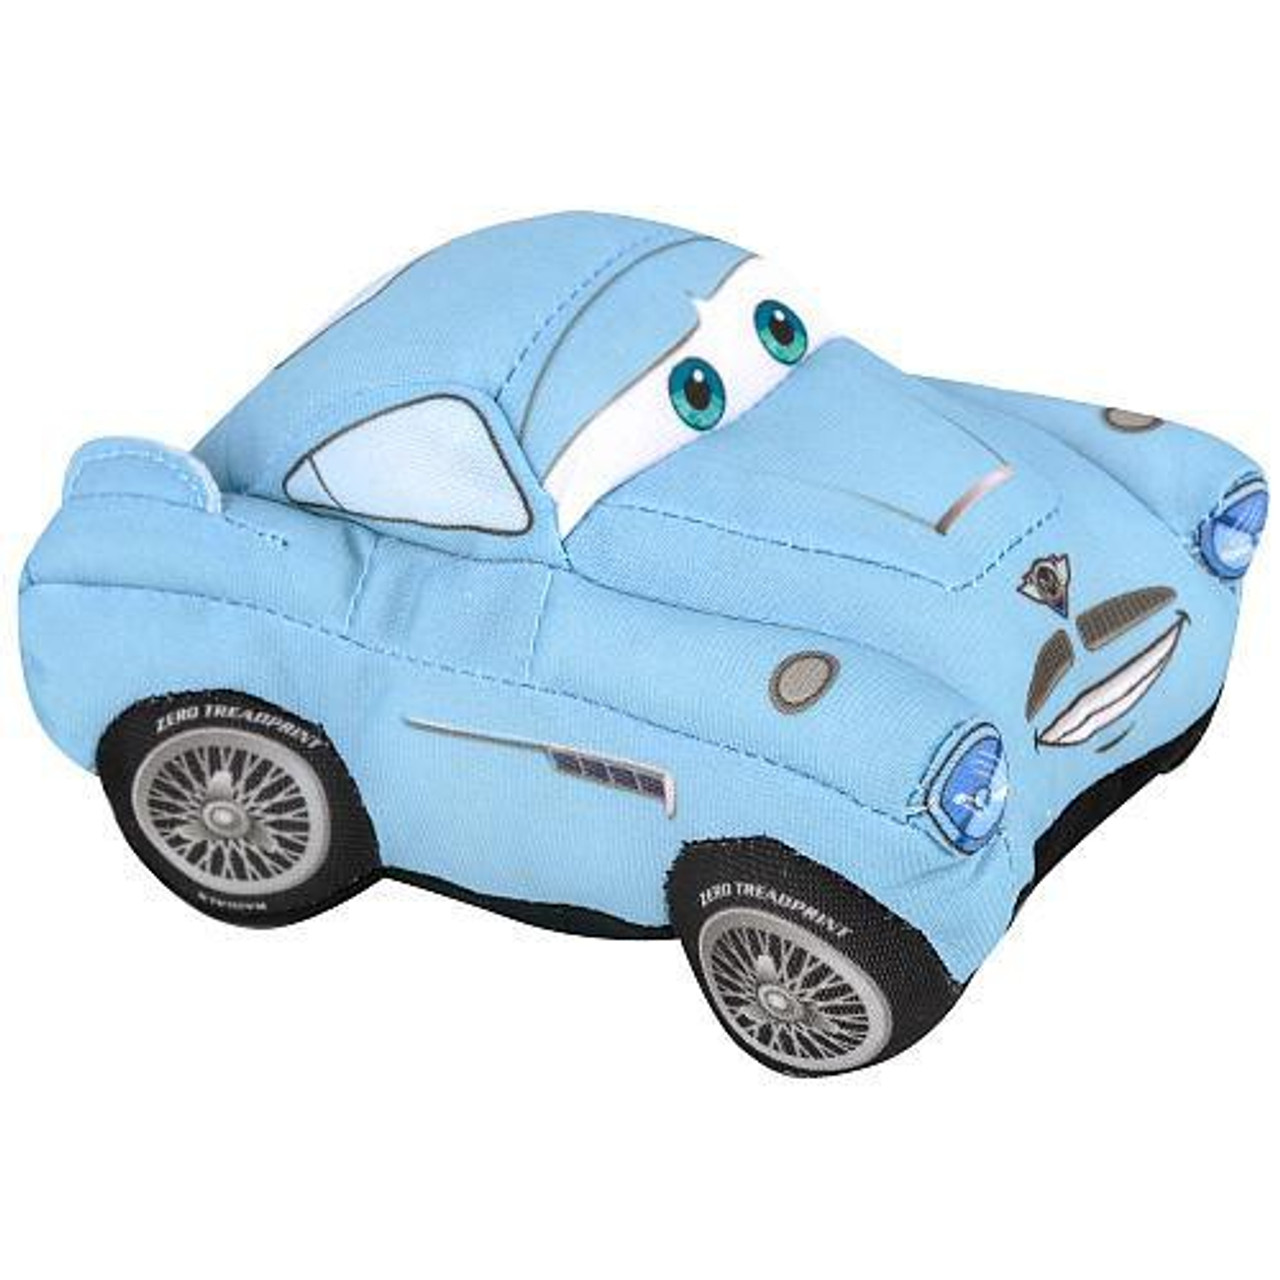 Disney Cars Cars 2 Plush Finn McMissile 5-Inch Talking Plush